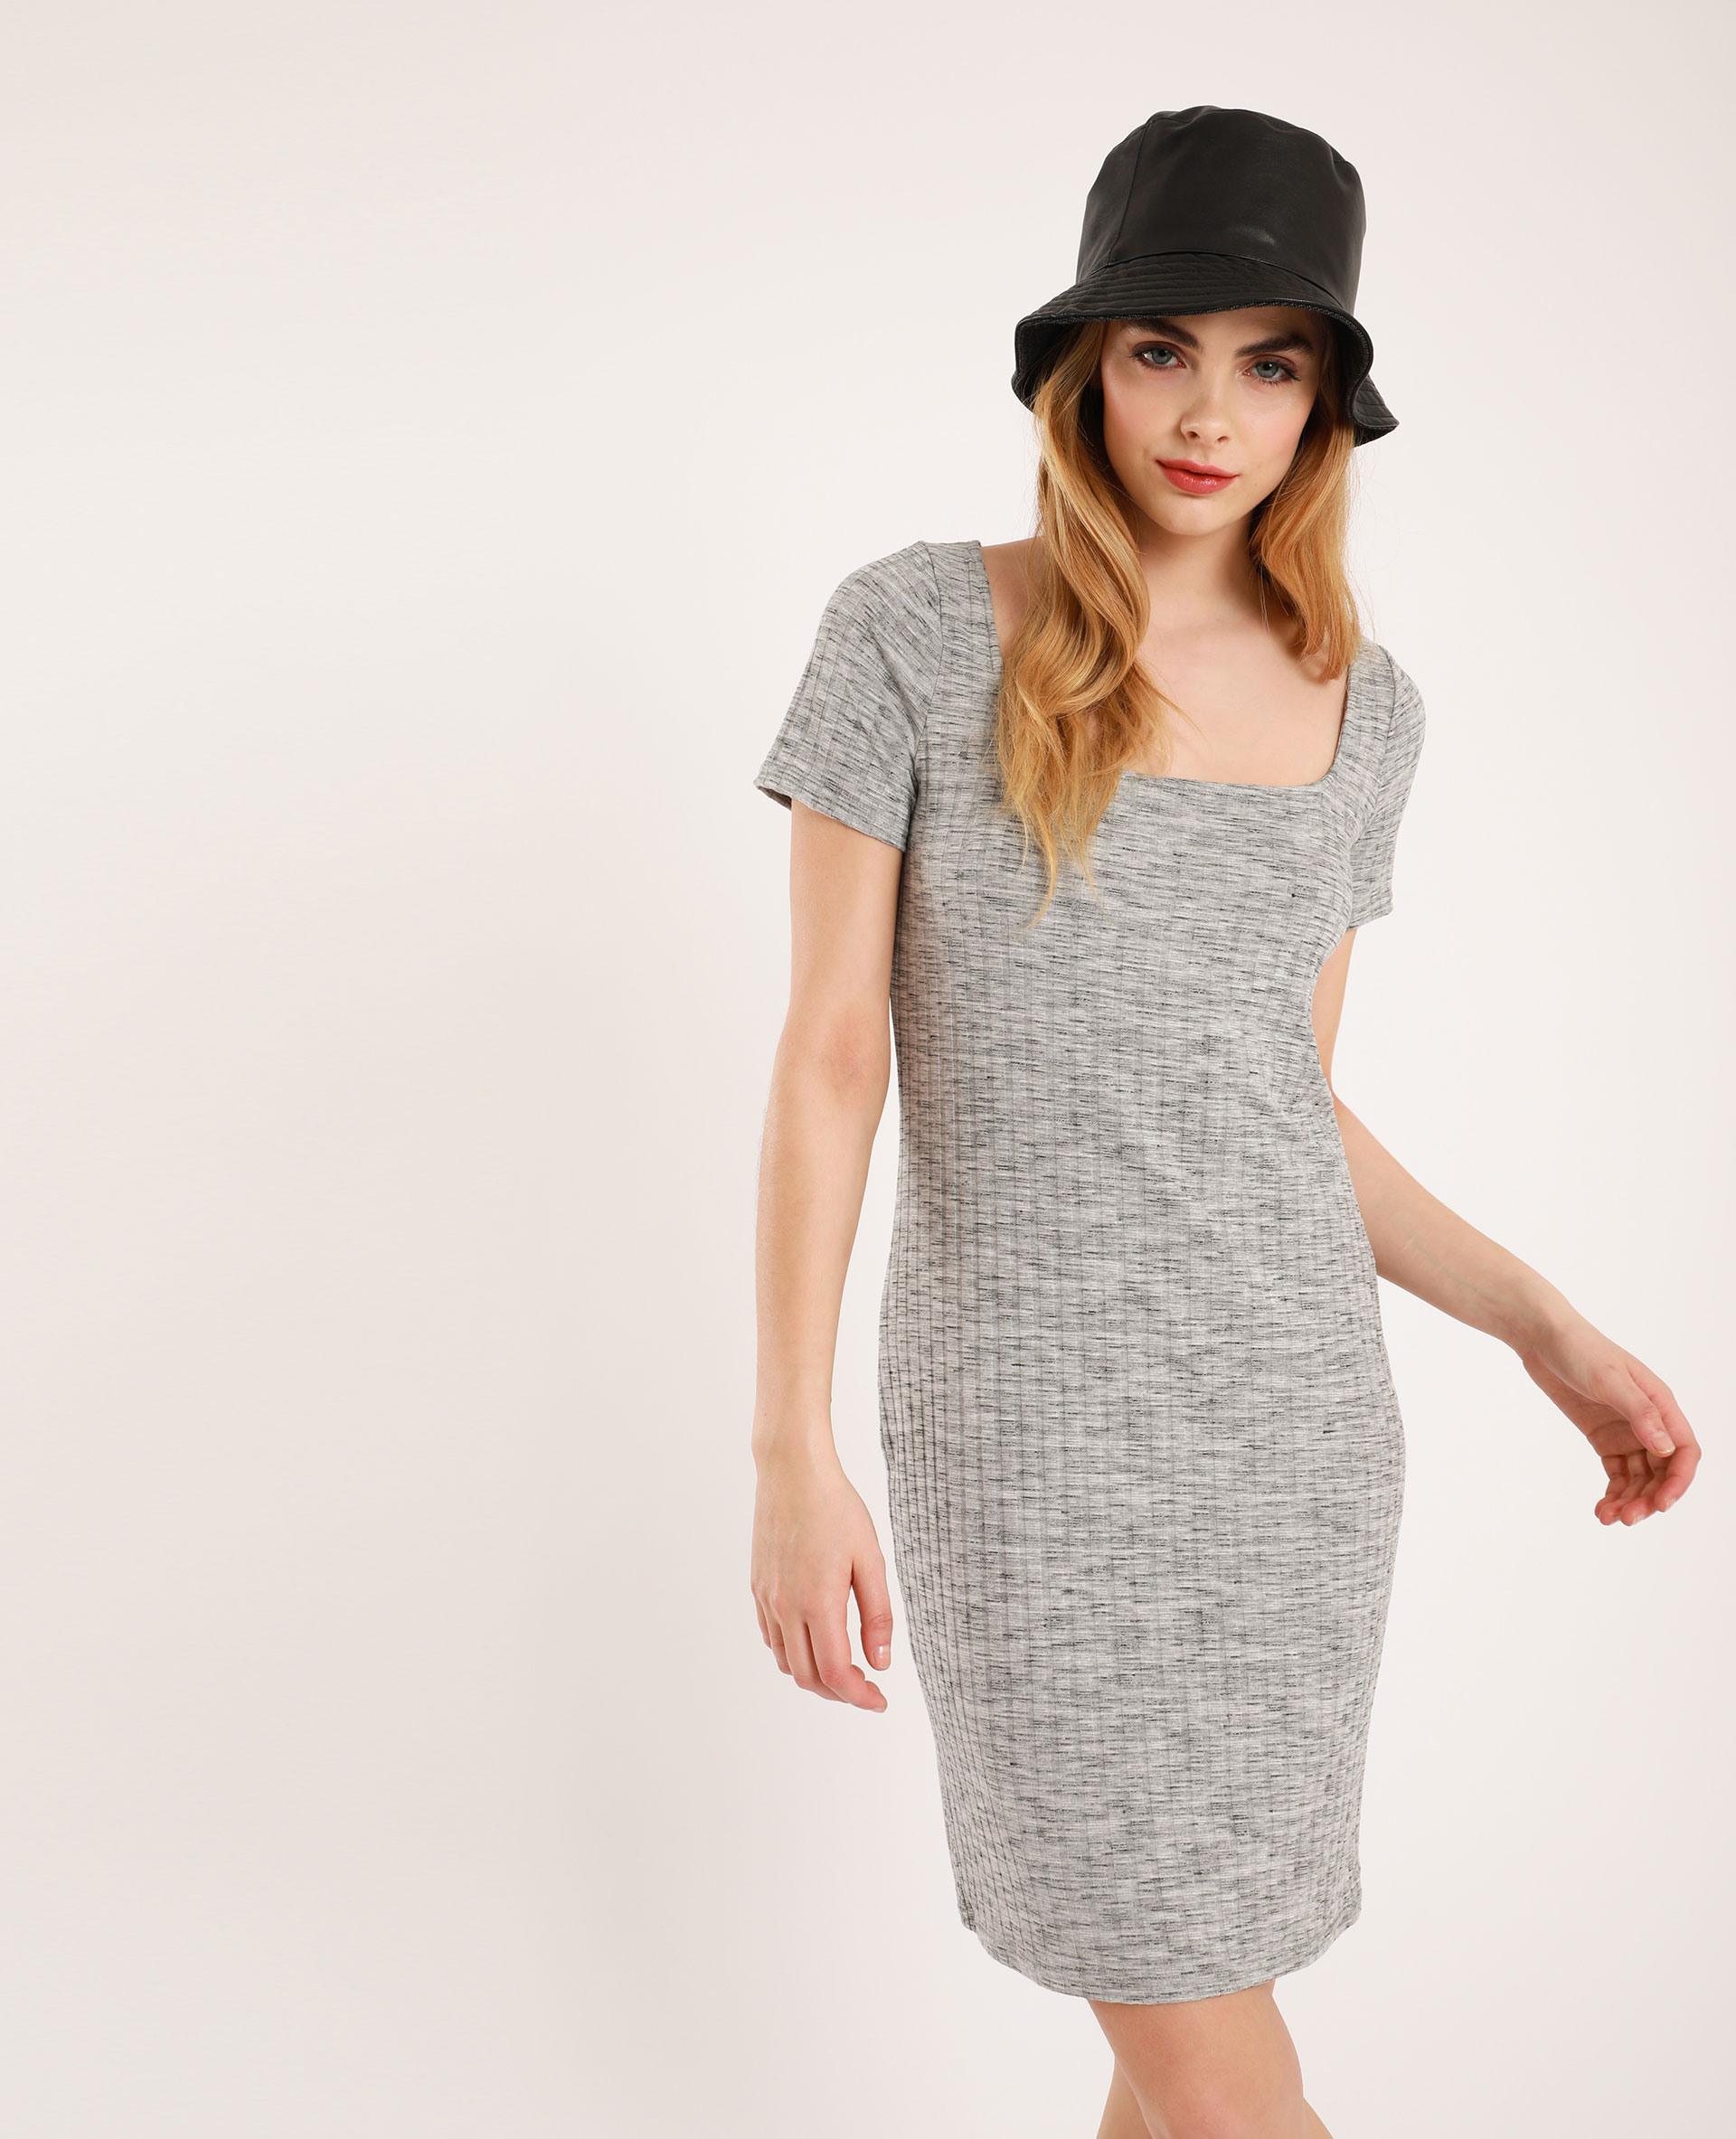 Geripptes Kleid Grau  781421816J08  Pimkie